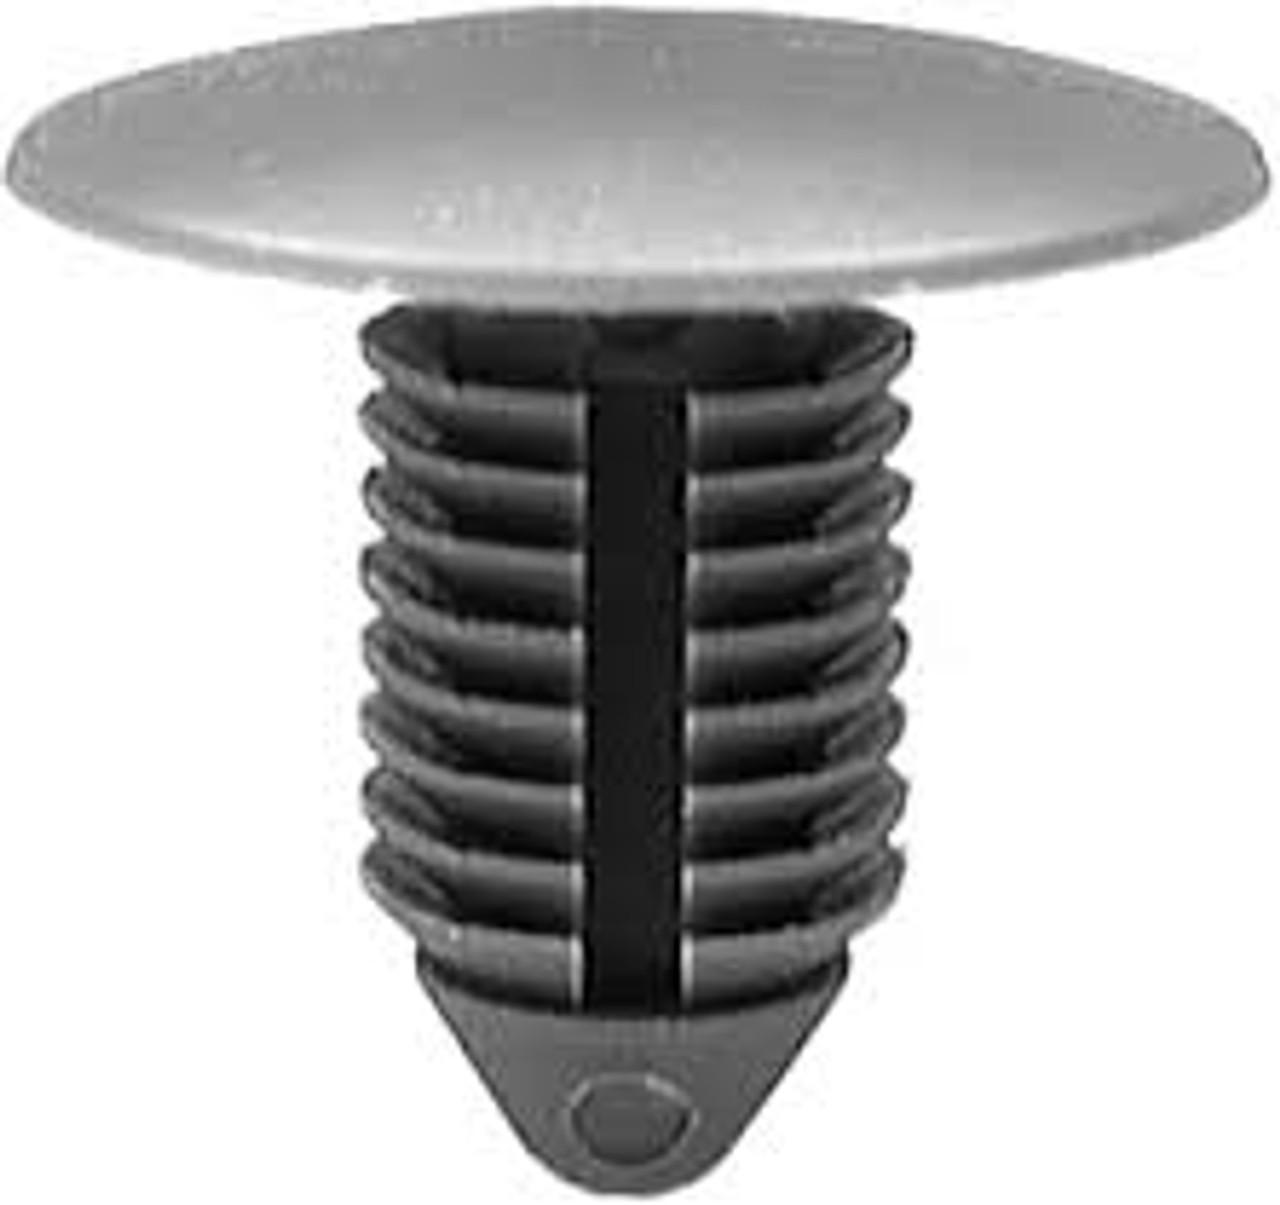 "GM Front End Stone Shield Retainer 1981-On Head Diameter: 7/8"" Stem Diameter: 7/16"" Stem Length: 13/16""  OEM# 22512276 Black Nylon 25 Per Box Click Next Image For Clip Detail Same As Auveco 16262 (50 Per Box)"